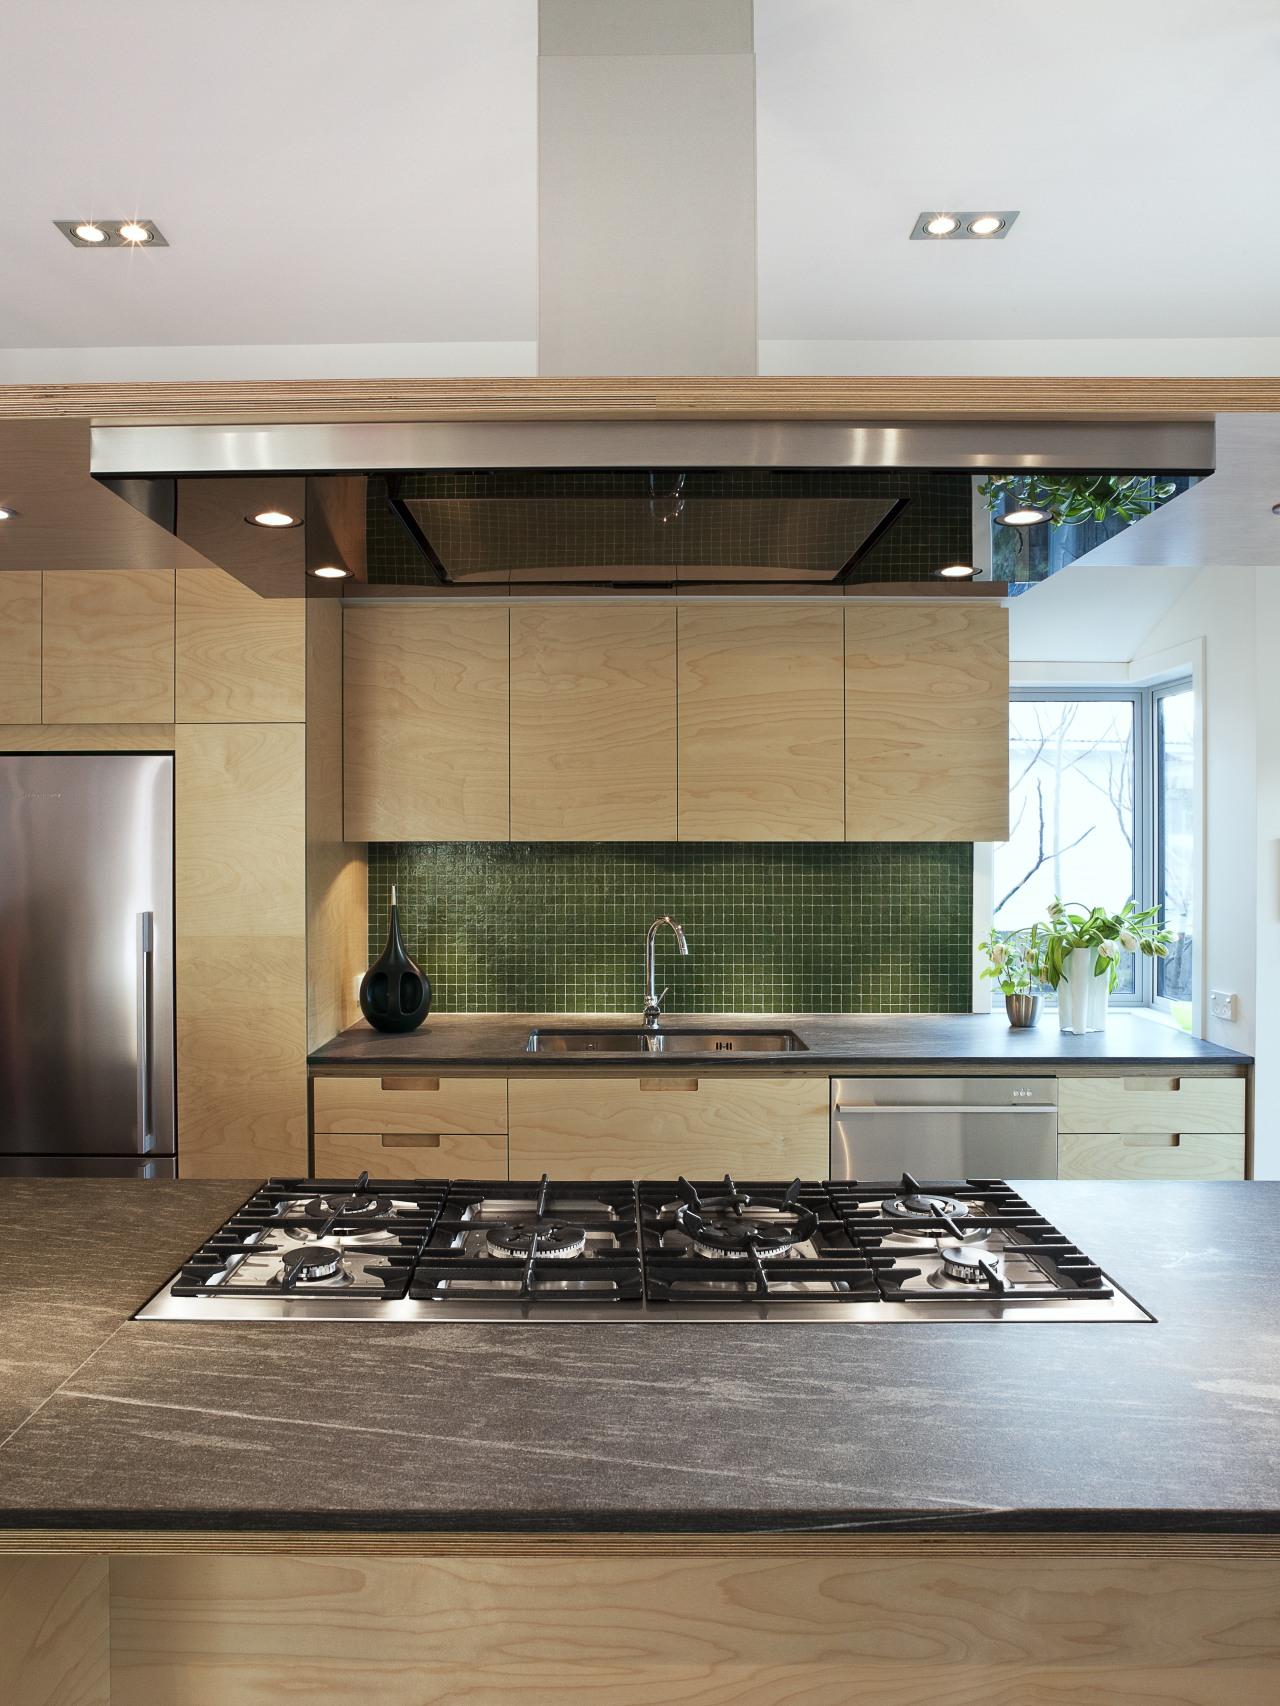 Chefs choice  Natalie Du Bois chooses Fisher architecture, countertop, floor, flooring, interior design, kitchen, gray